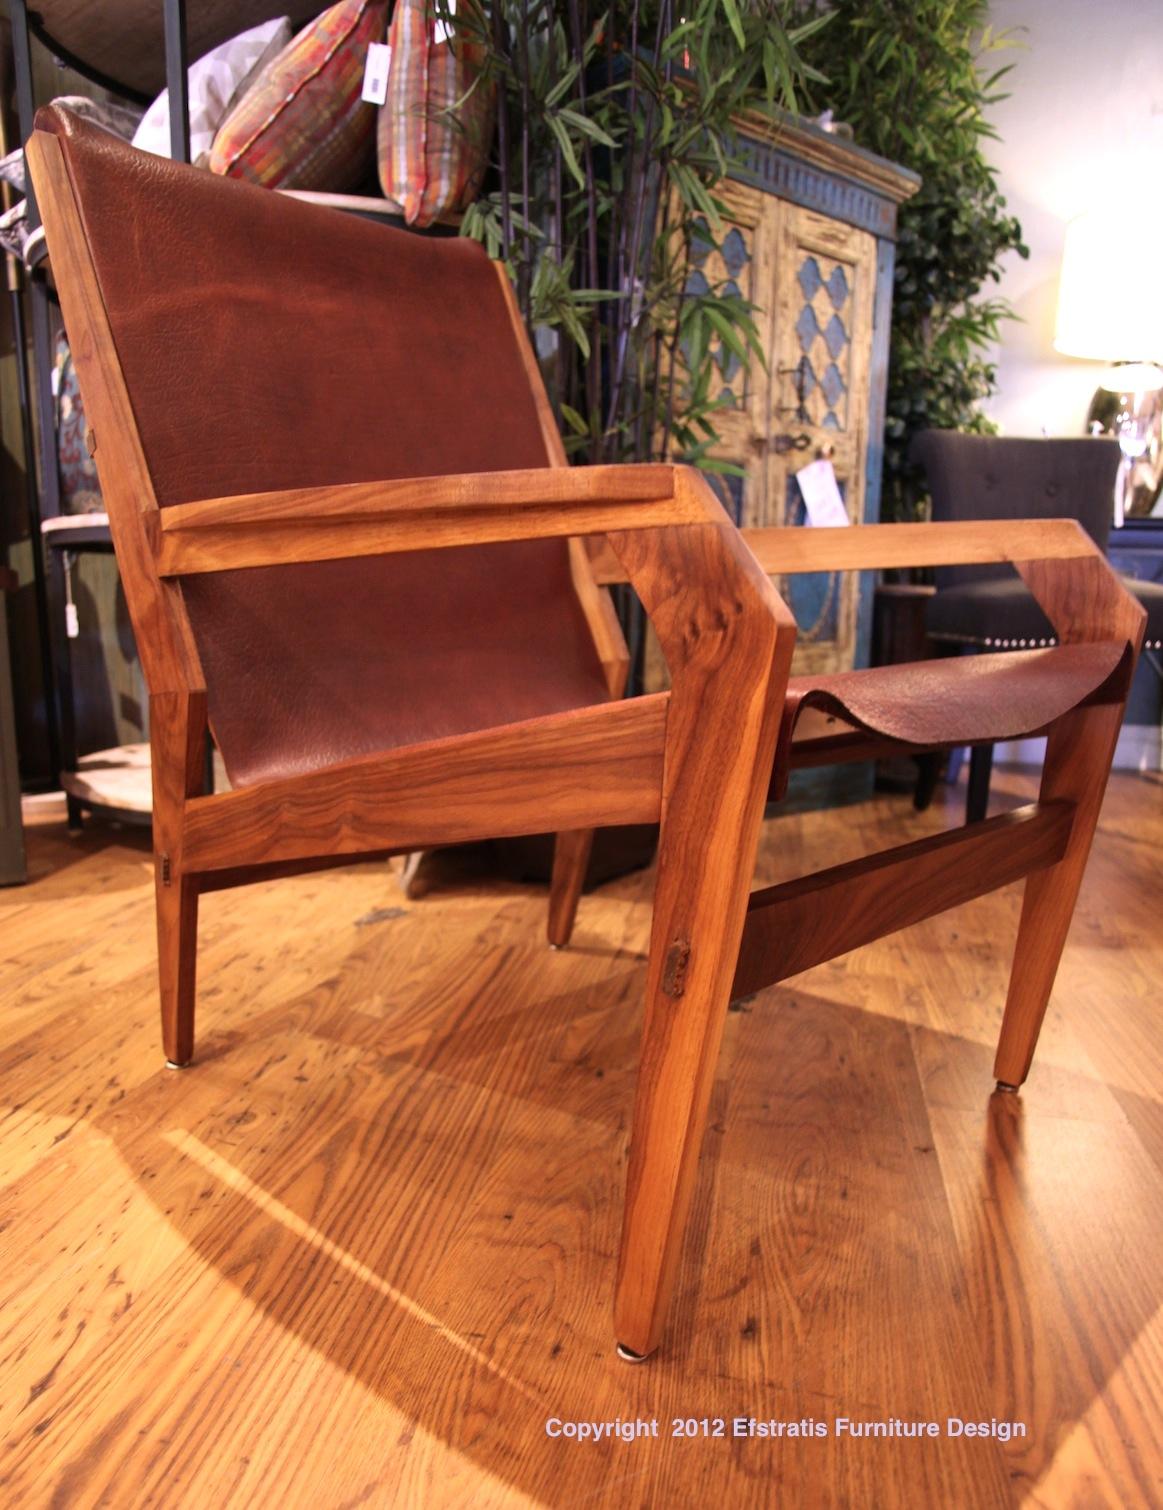 Furniture, fashion, midcentury, modern, retro | coolmodern